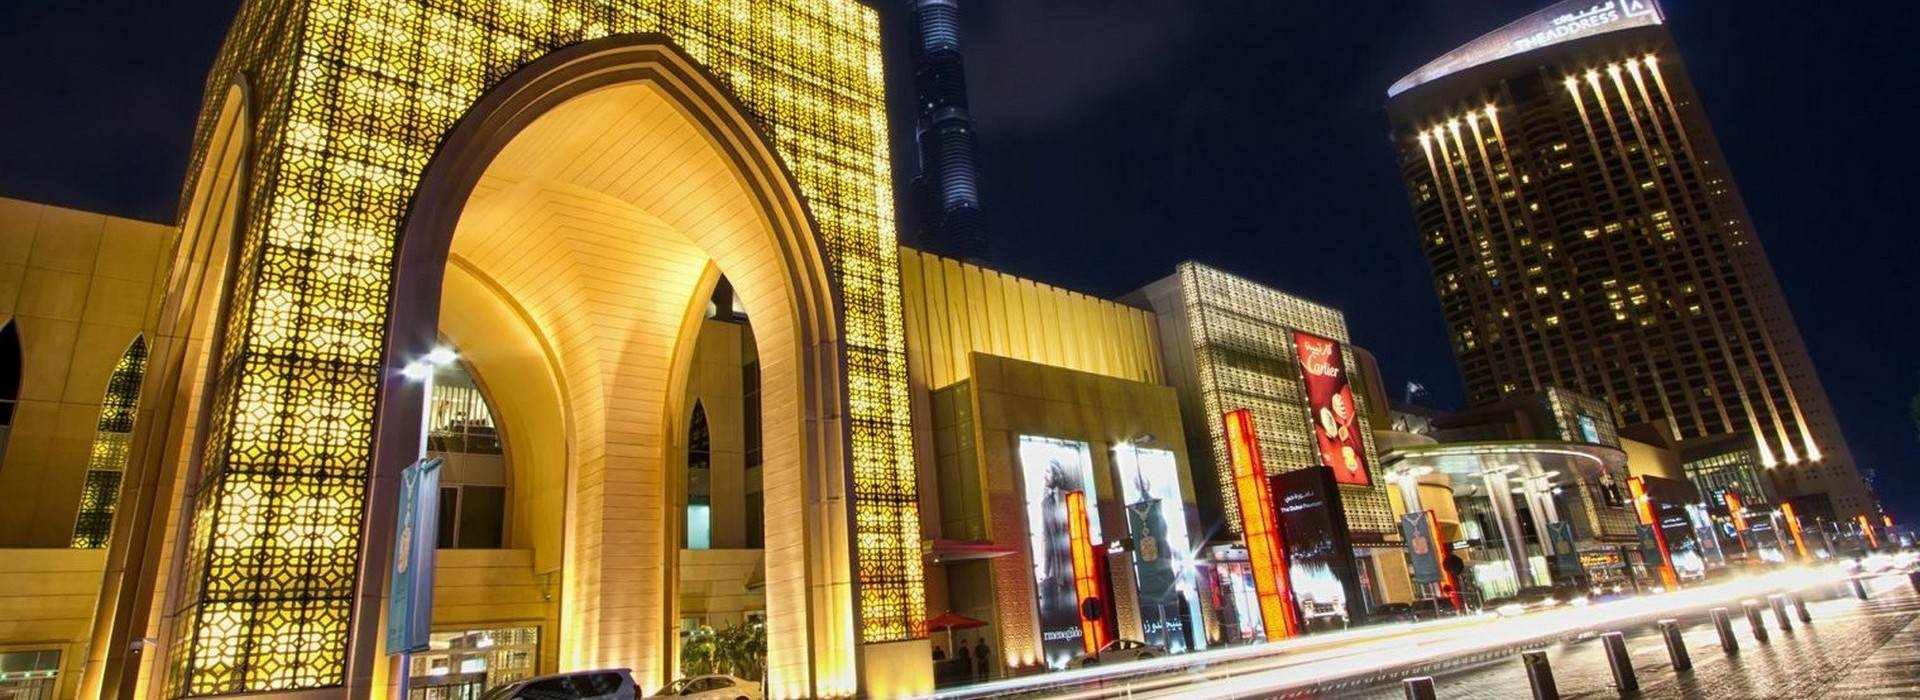 dubai-shopping-mall-©visitdubai